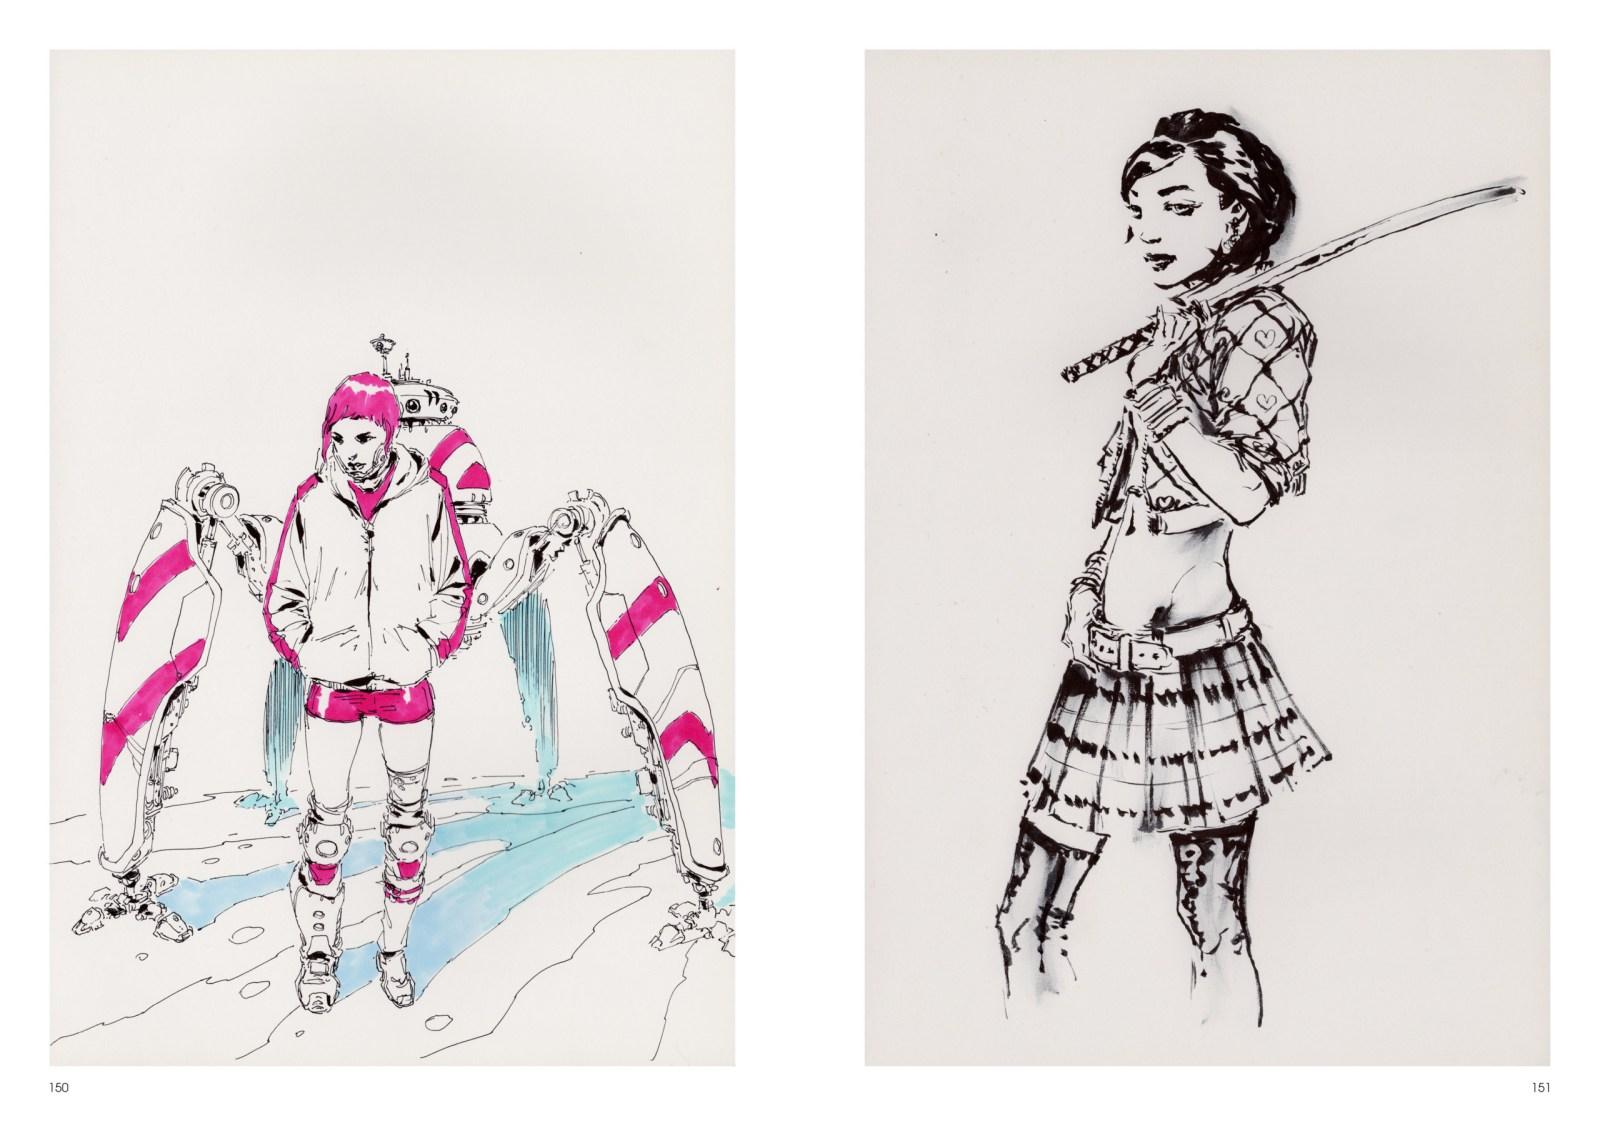 Image de l'artbook Daya de Daniel Landerman. Badass girls.